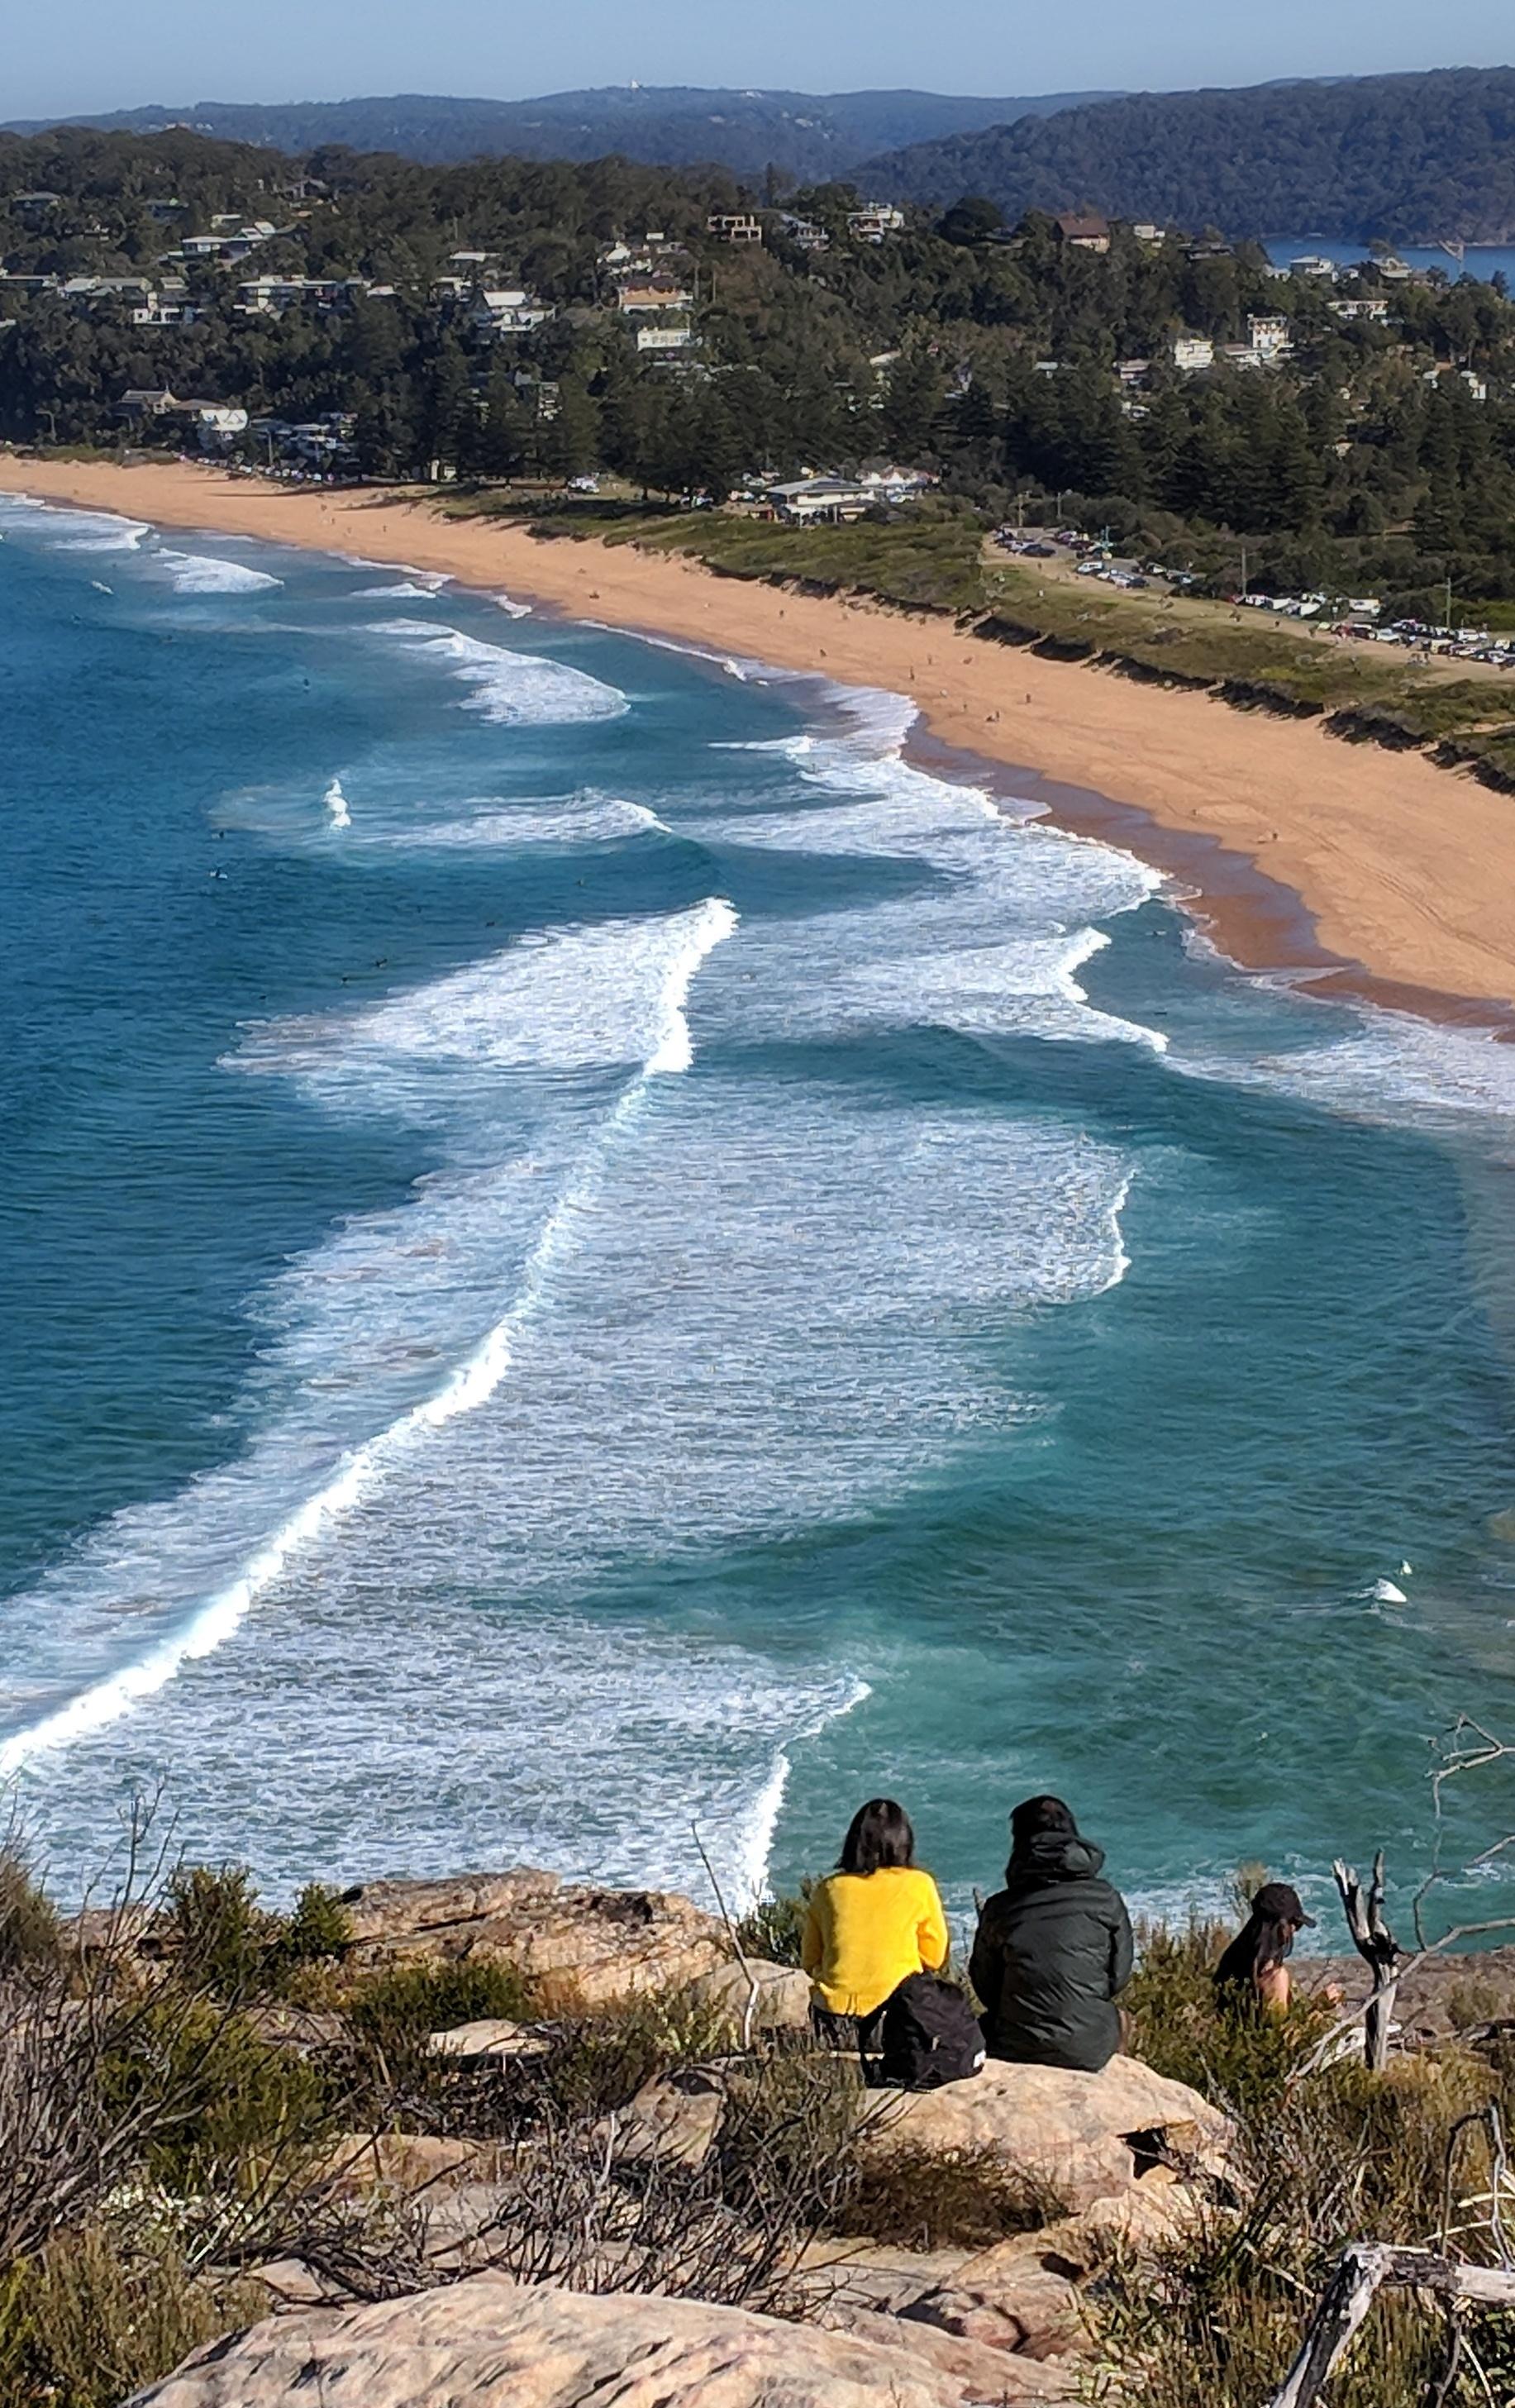 View of Palm Beach from Barrenjoey Head, Sydney